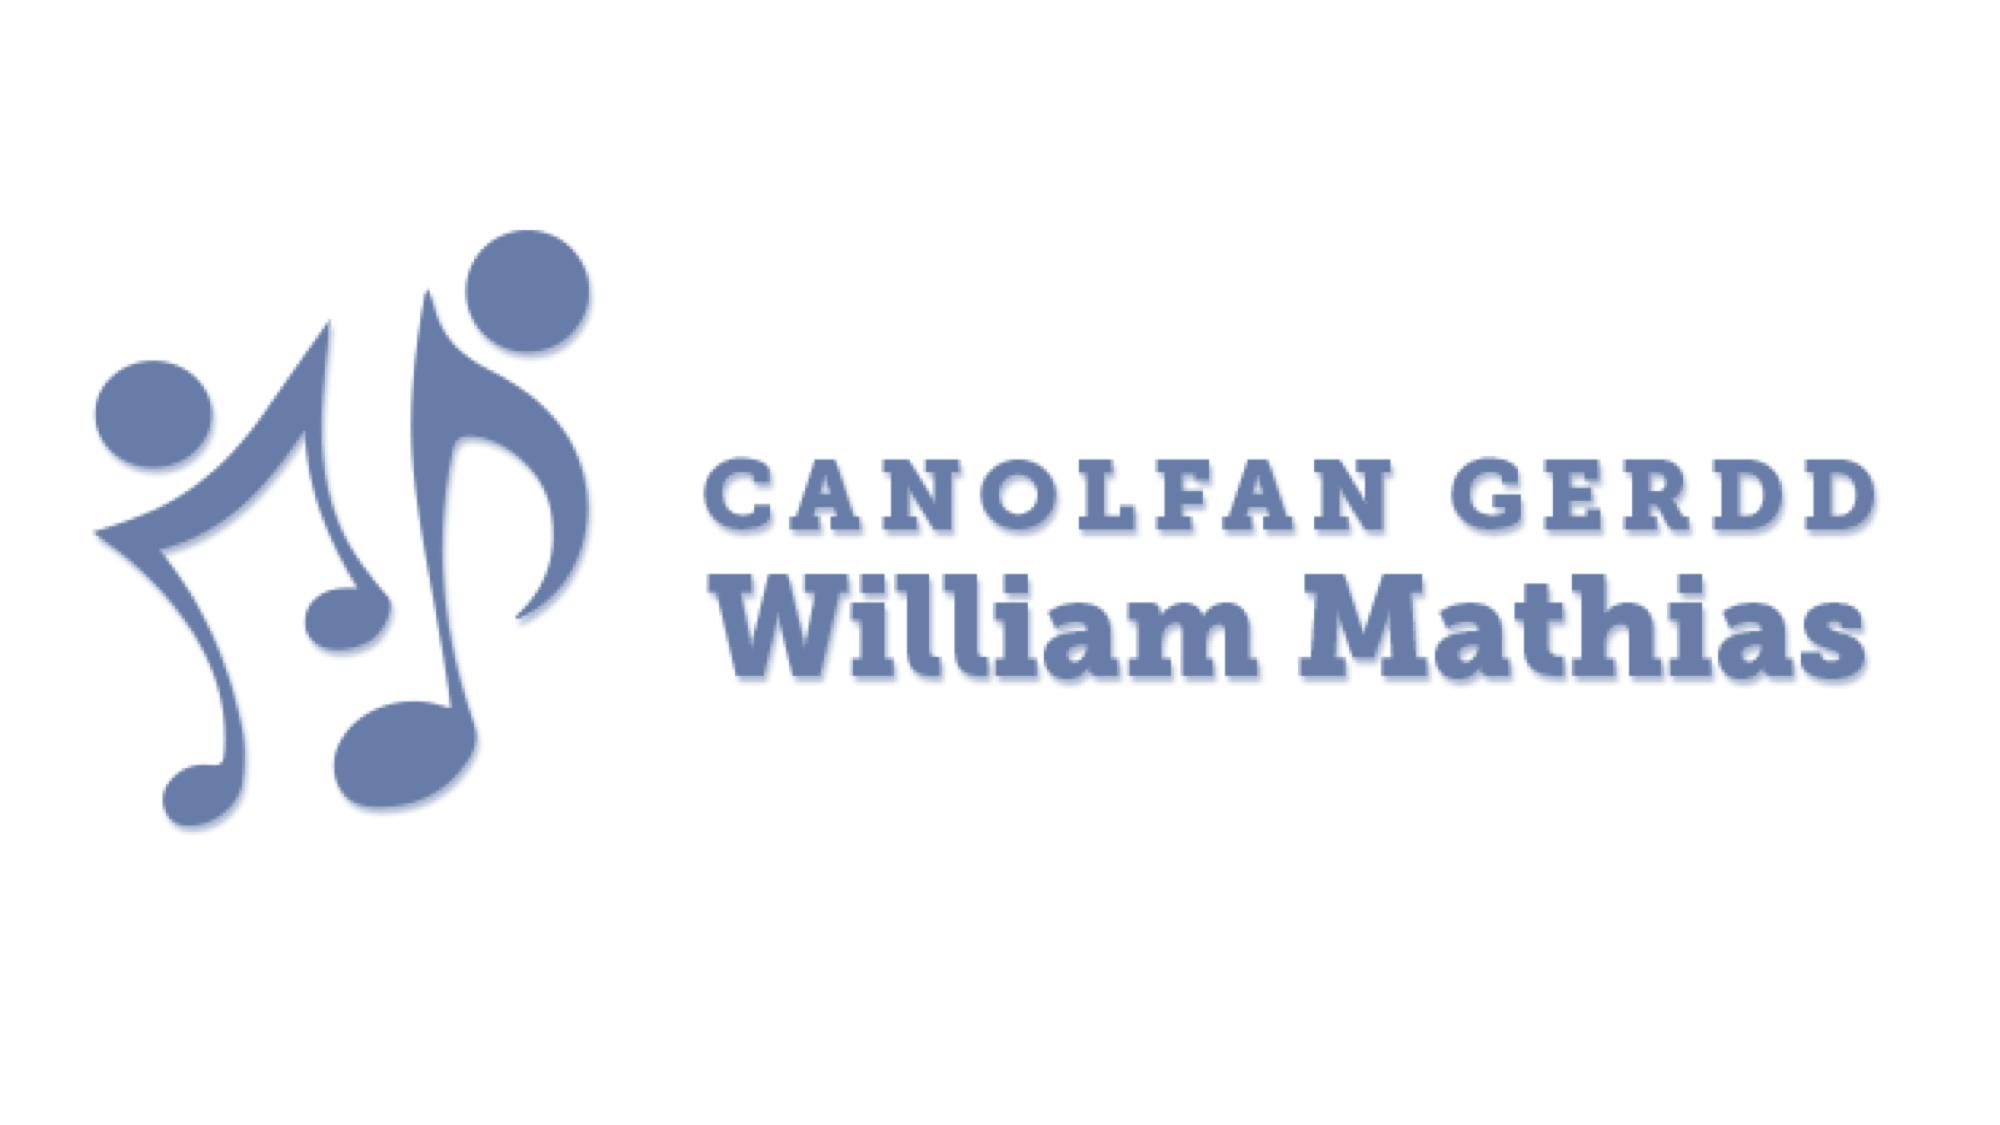 Canolfan Gerdd William Mathias